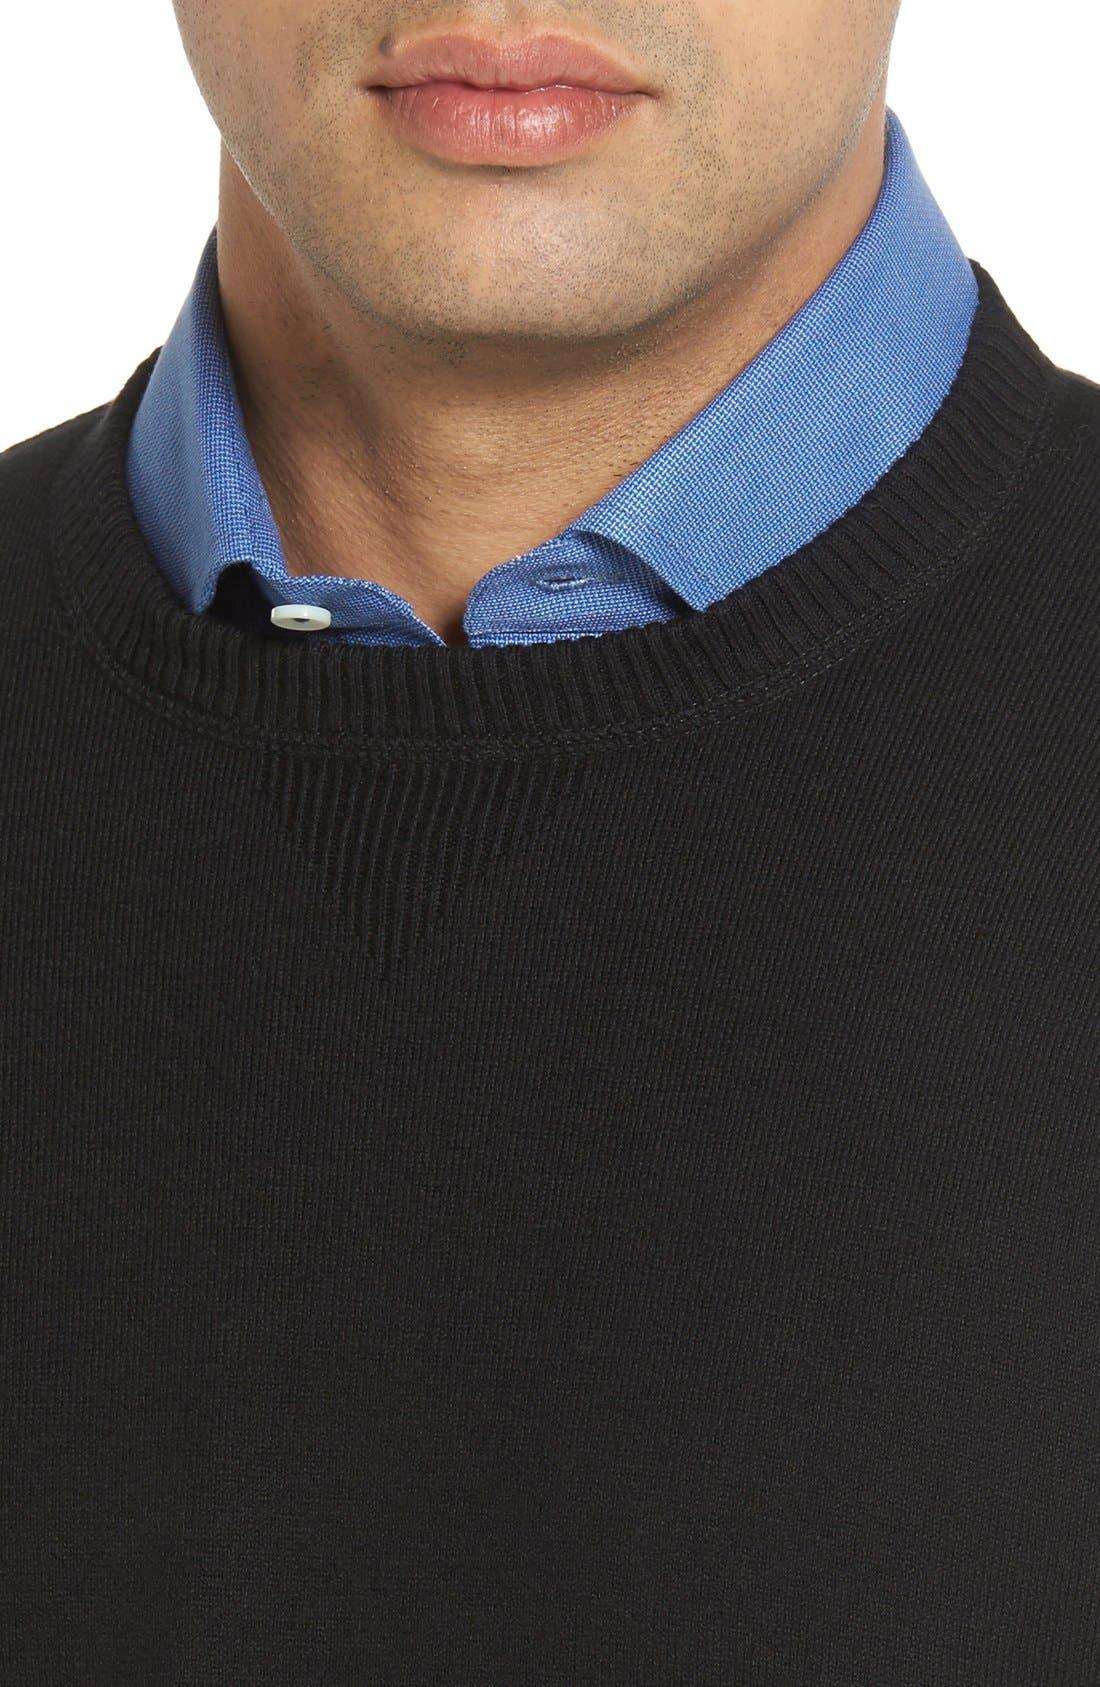 'Jersey Sport' Cotton Blend Crewneck Sweater,                             Alternate thumbnail 4, color,                             001